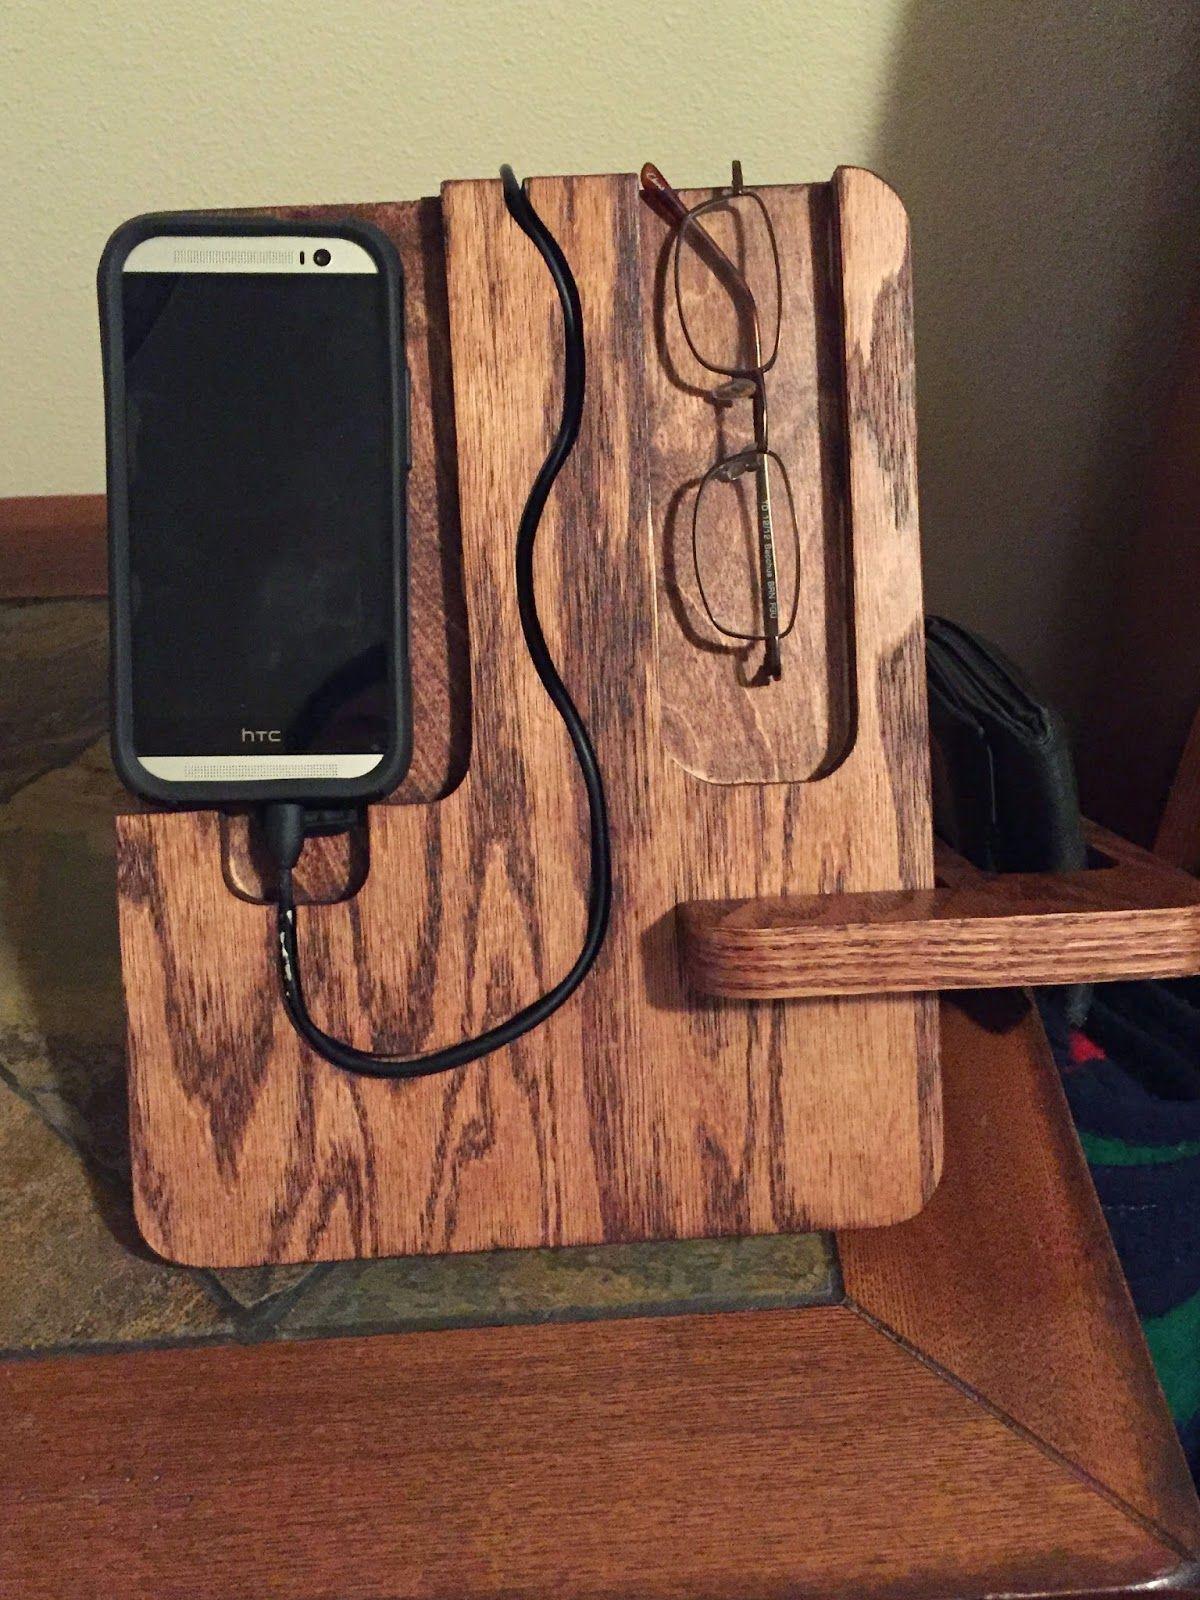 Phone, eyeglasses, wallet holder